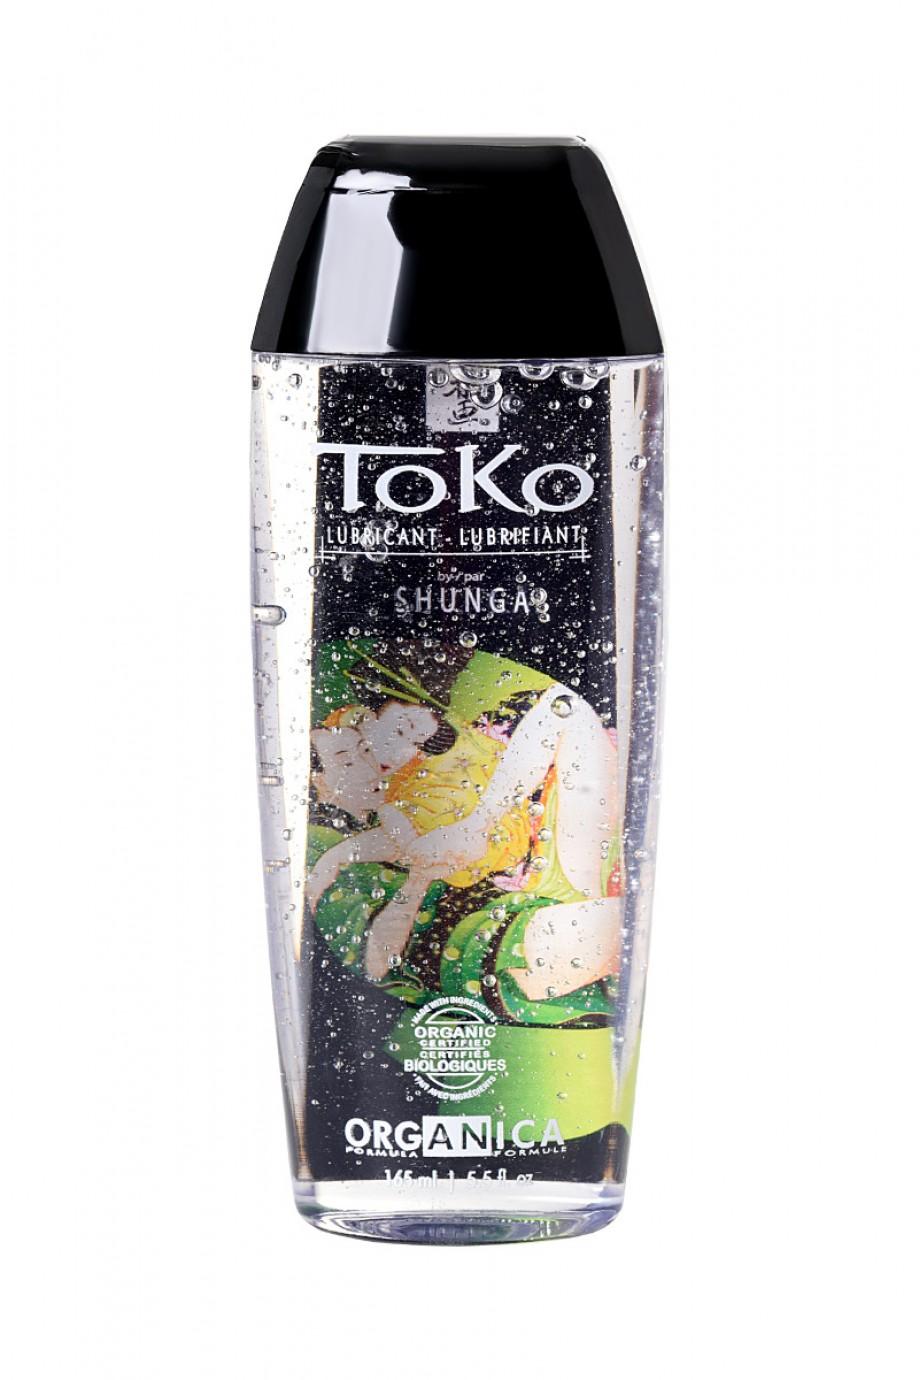 Лубрикант Shunga Toko Organica, 165 мл